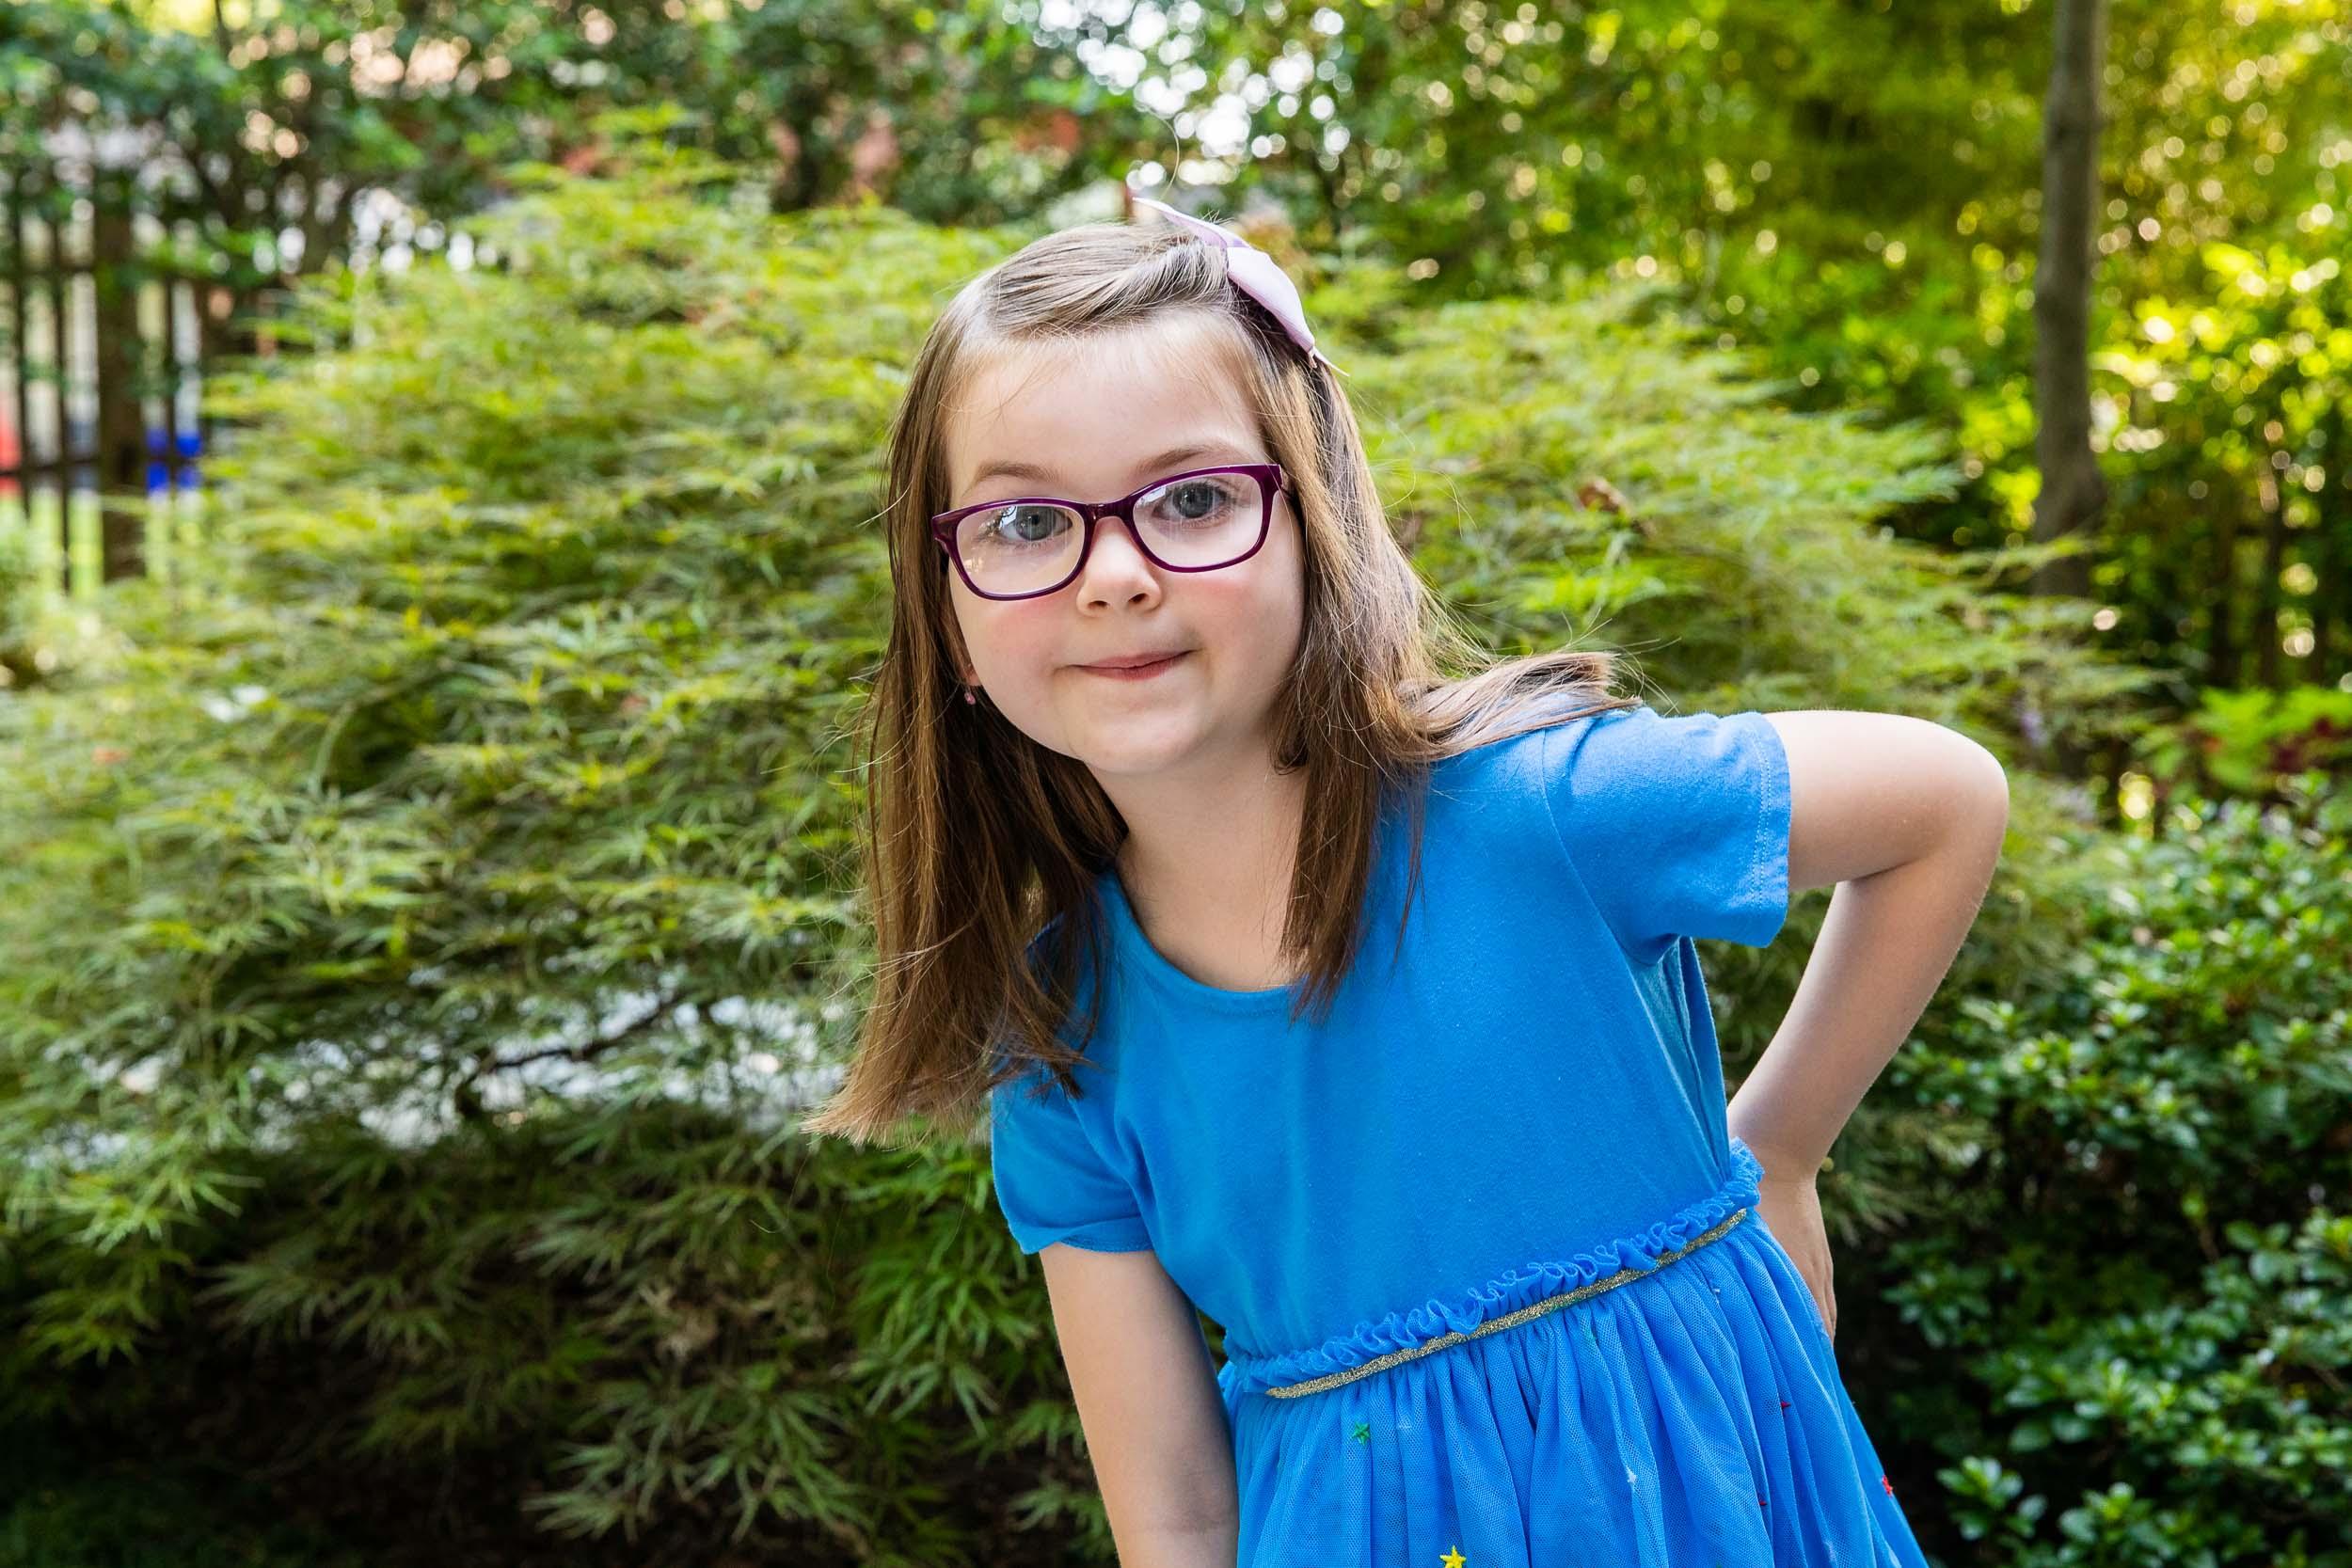 Chevy Chase MD Backyard Family Portraits Maryland Photography Tara Parekh Photography -02.jpg